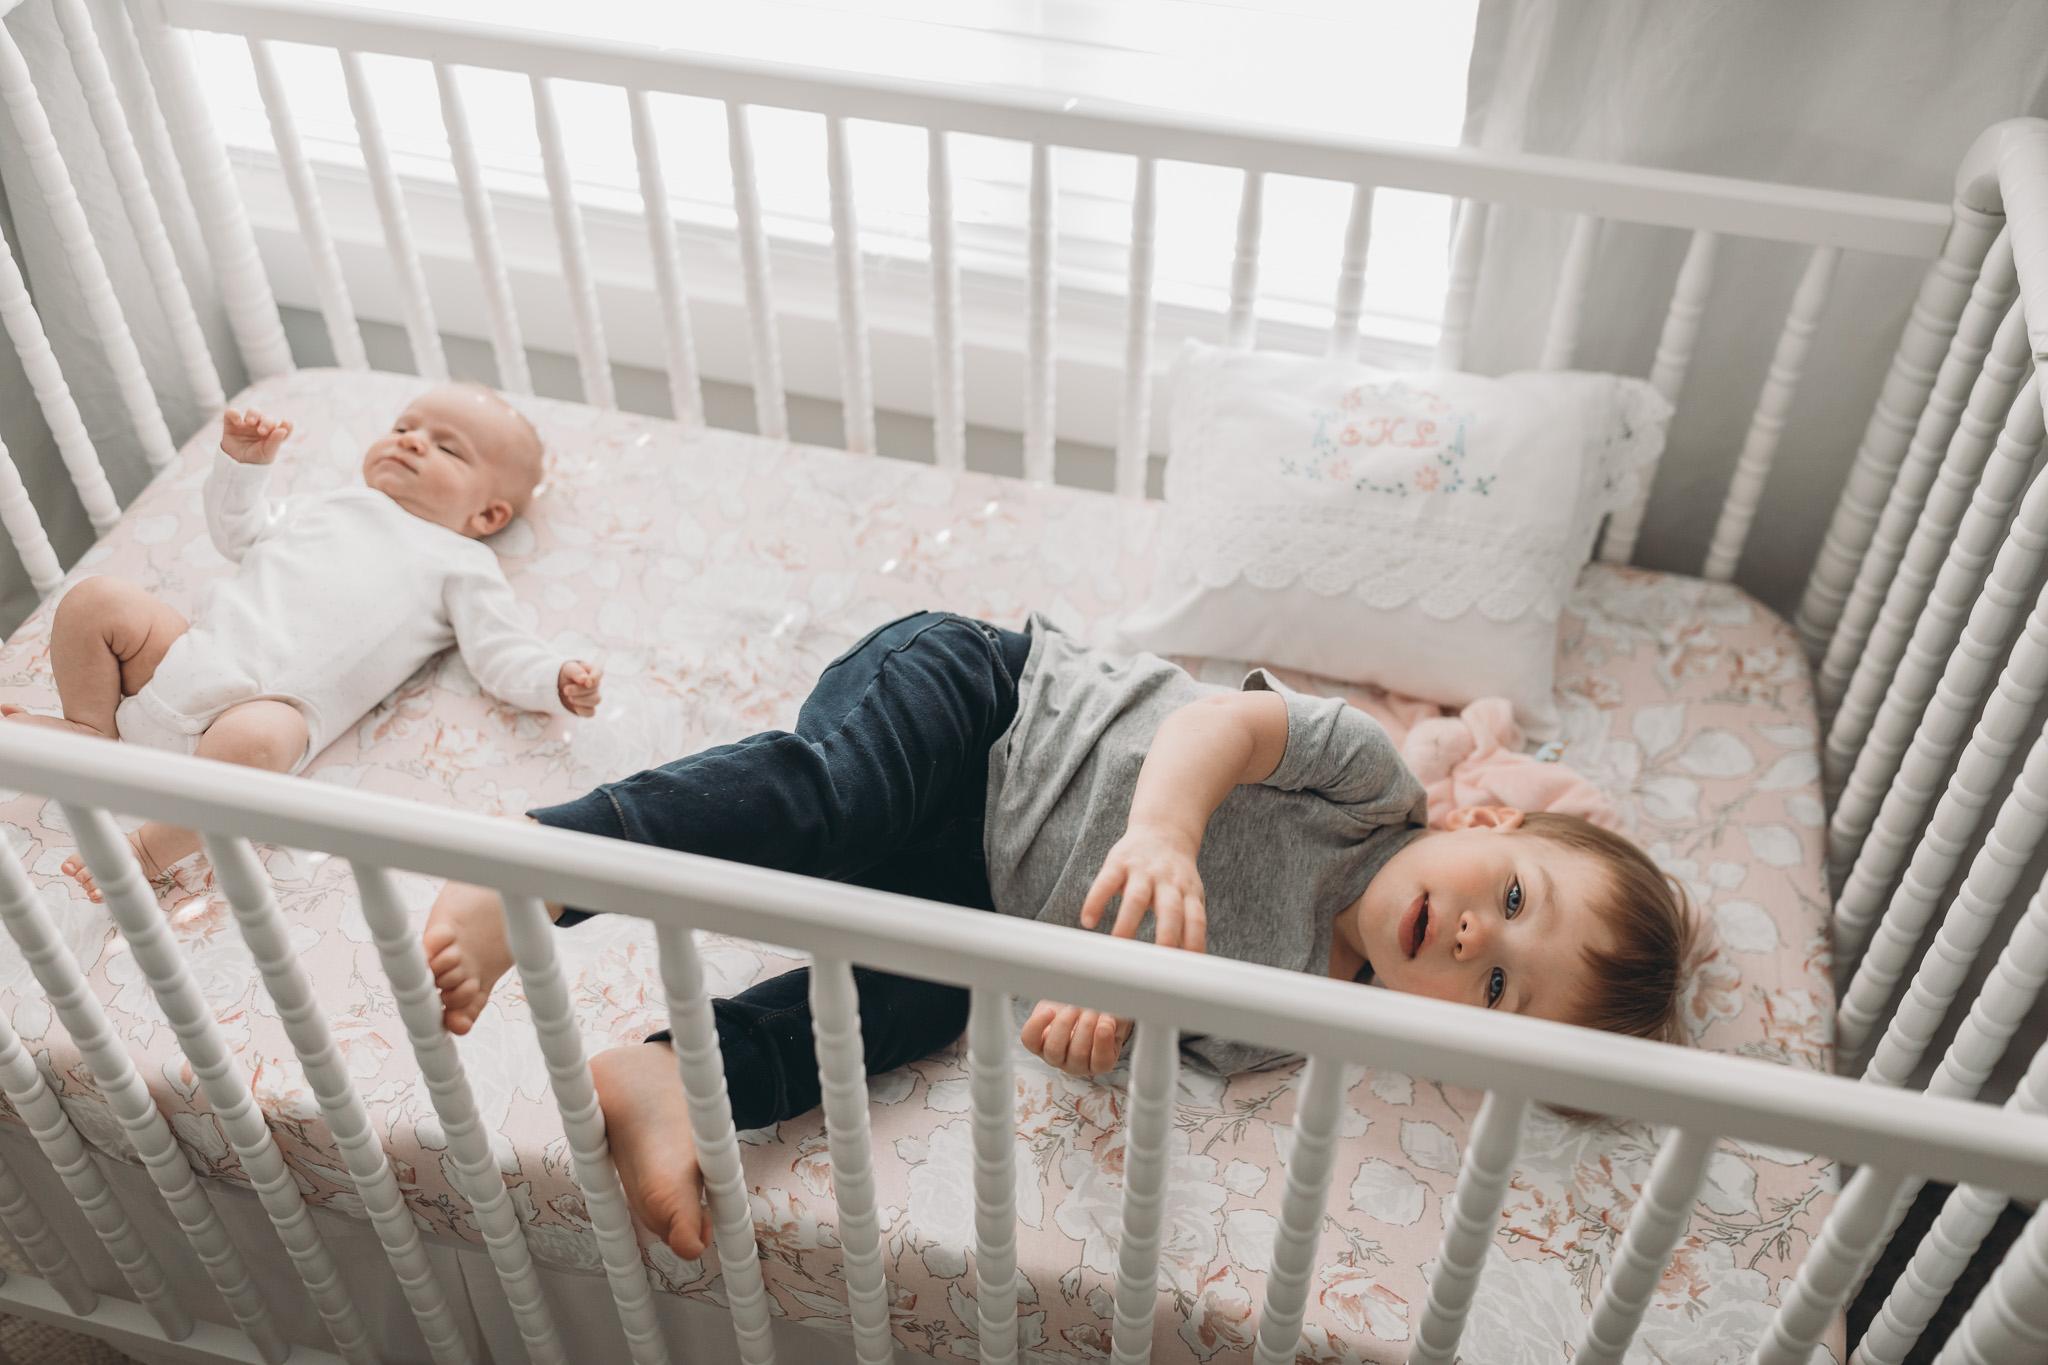 Siblings Laying in Crib